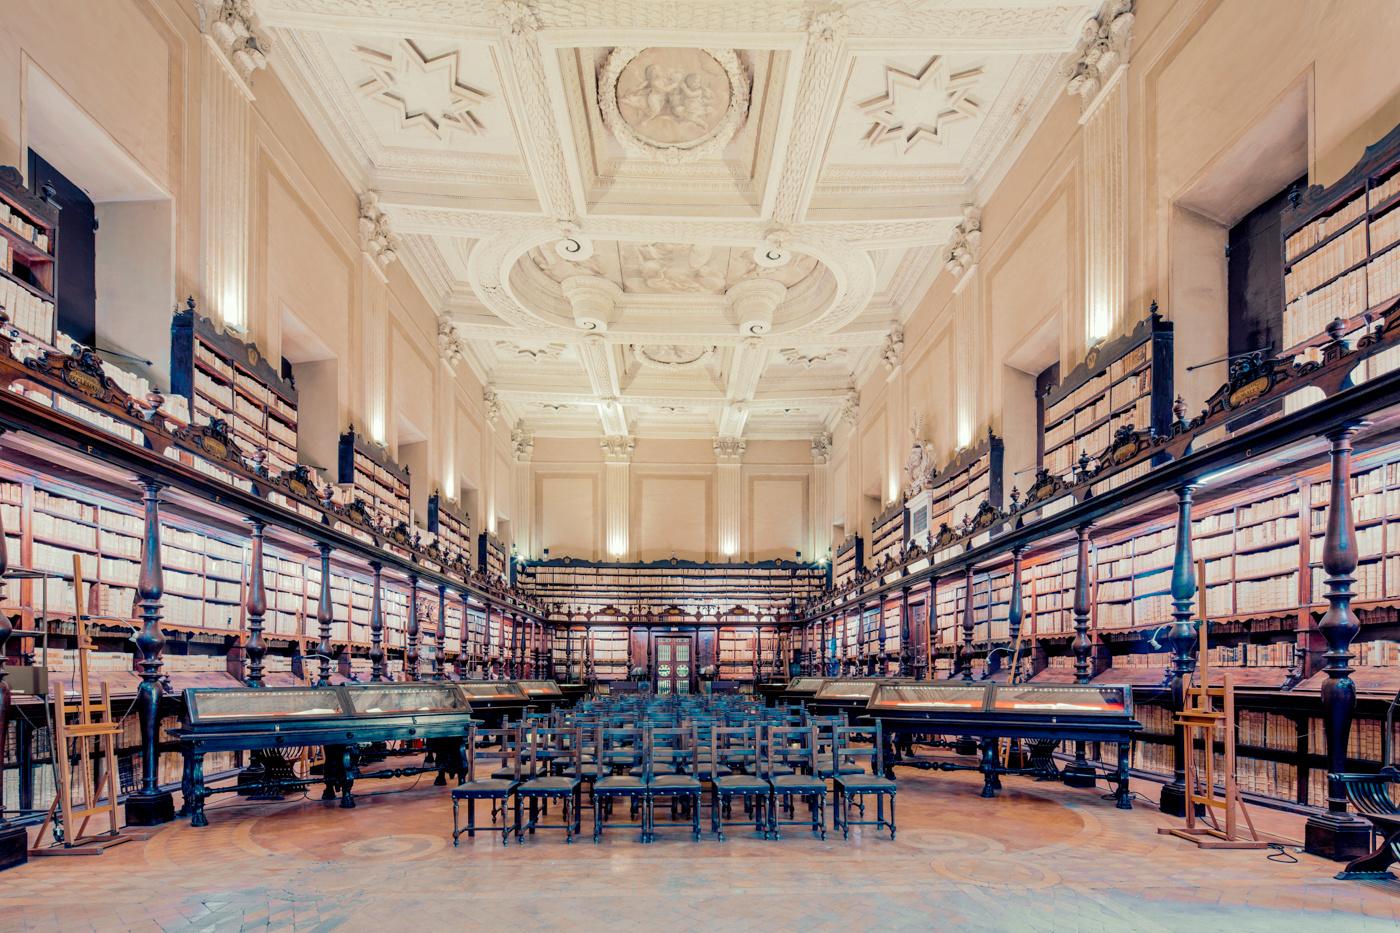 The Biblioteca Vallicellia #1, Roma, Italy, 2013